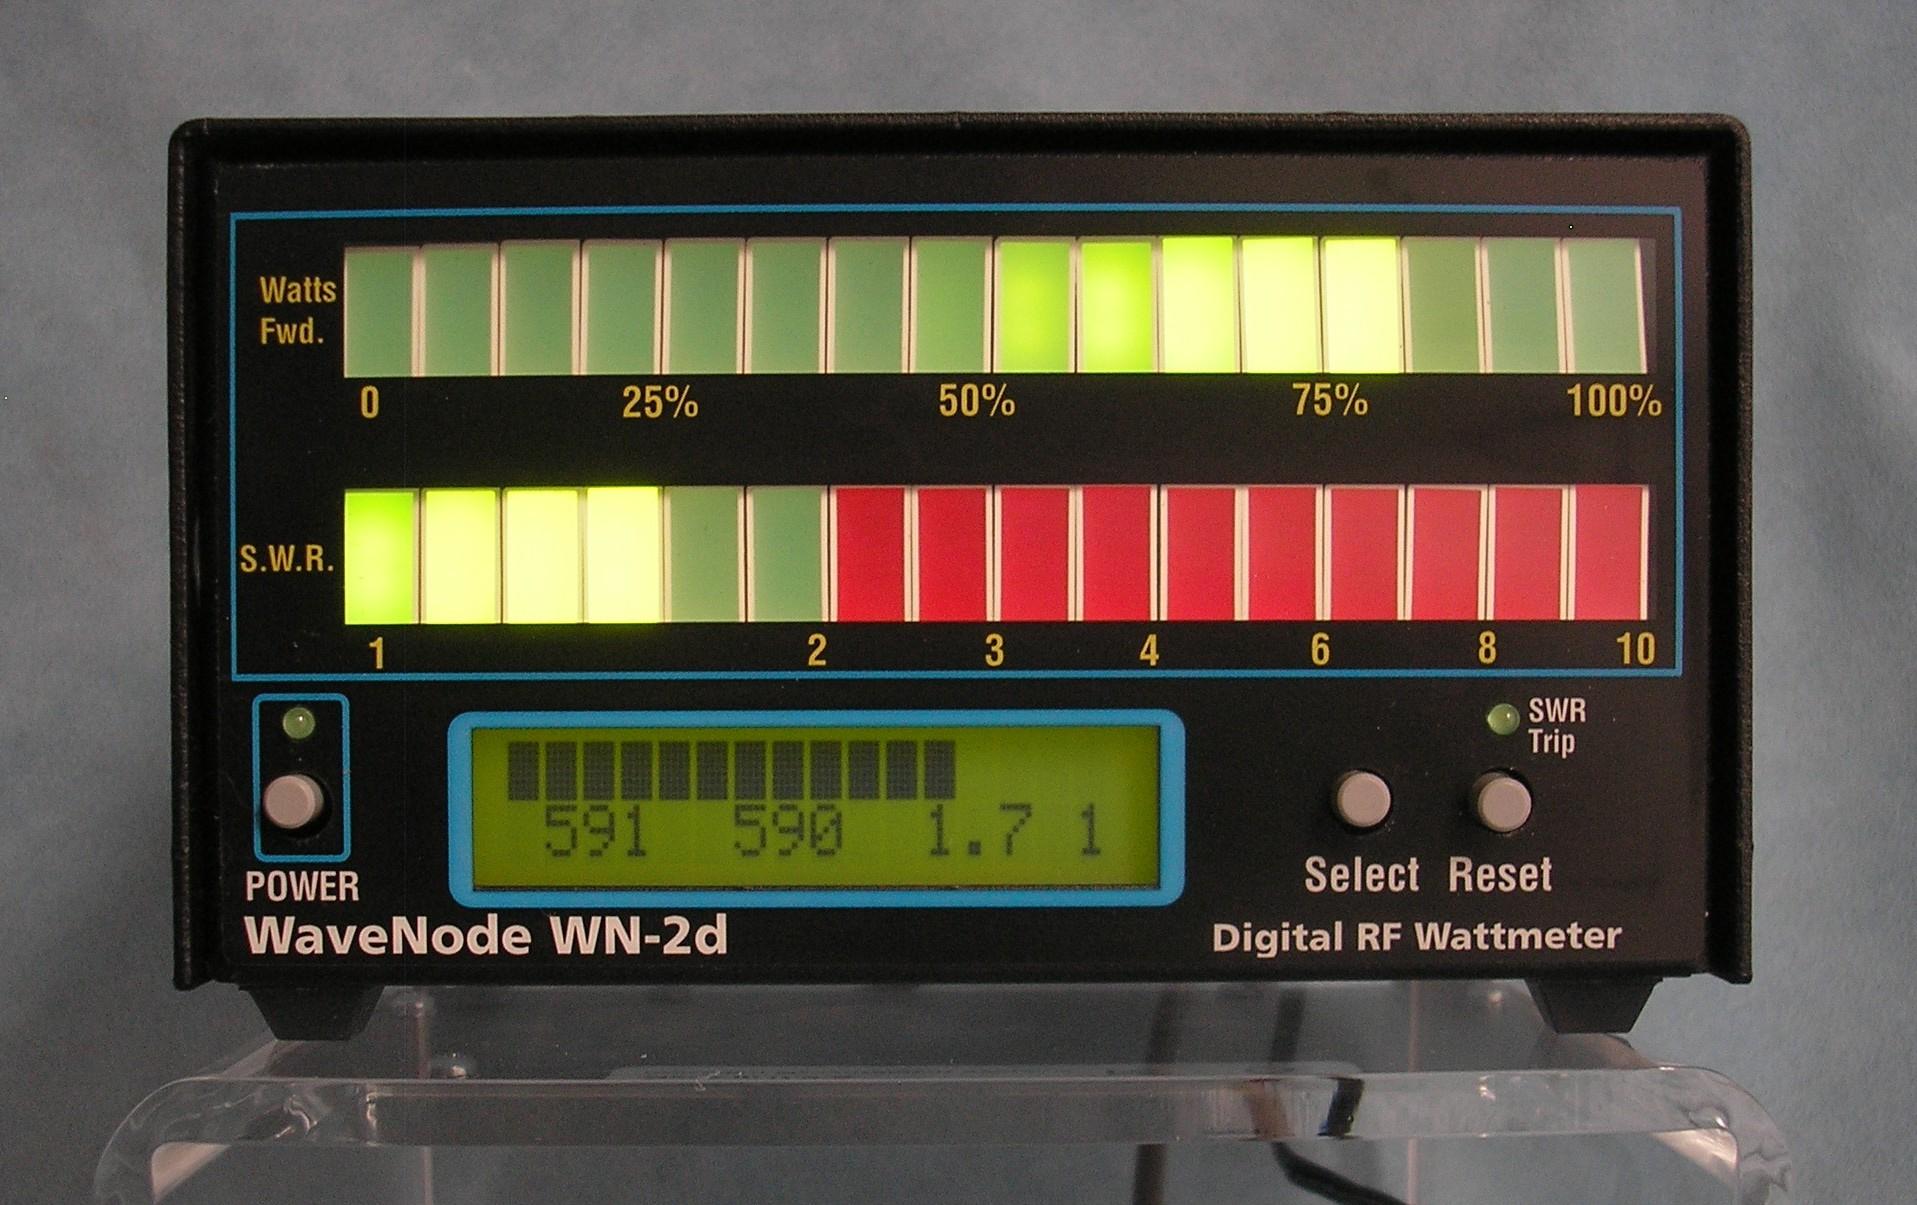 Wavennode WN-2D front view